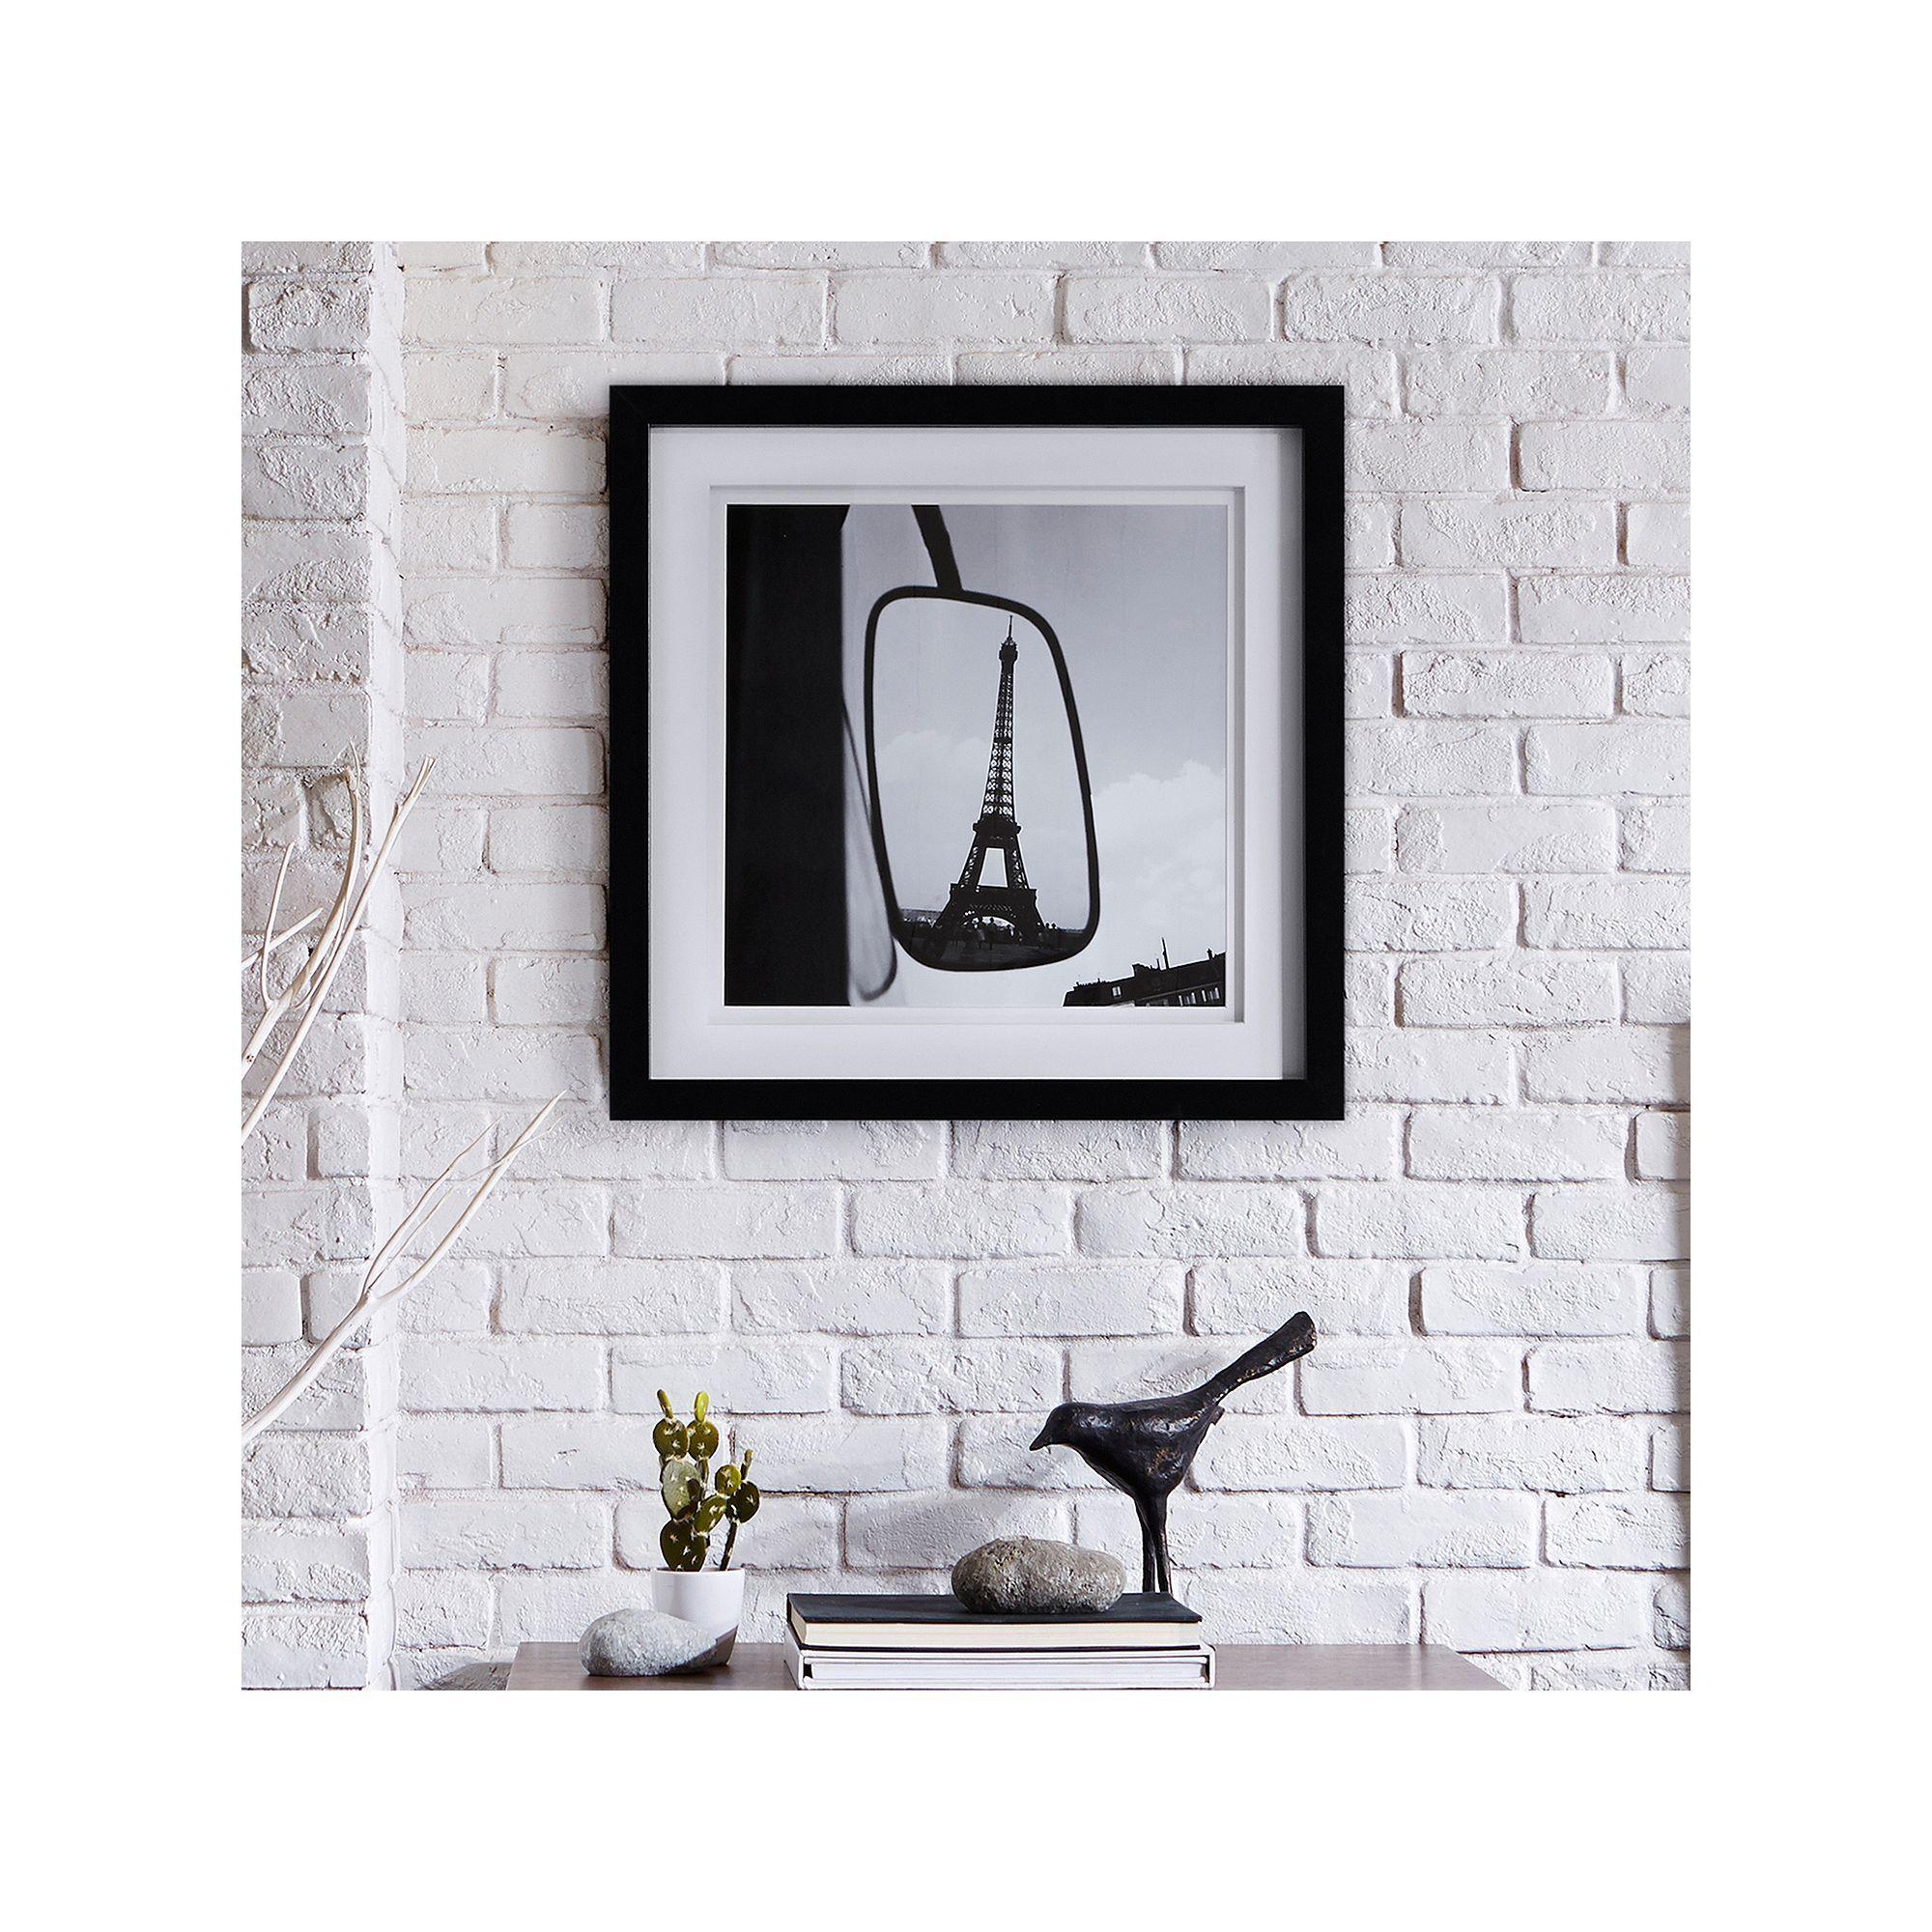 Inkivy uueiffel tower reflectionuu framed wall art black framed